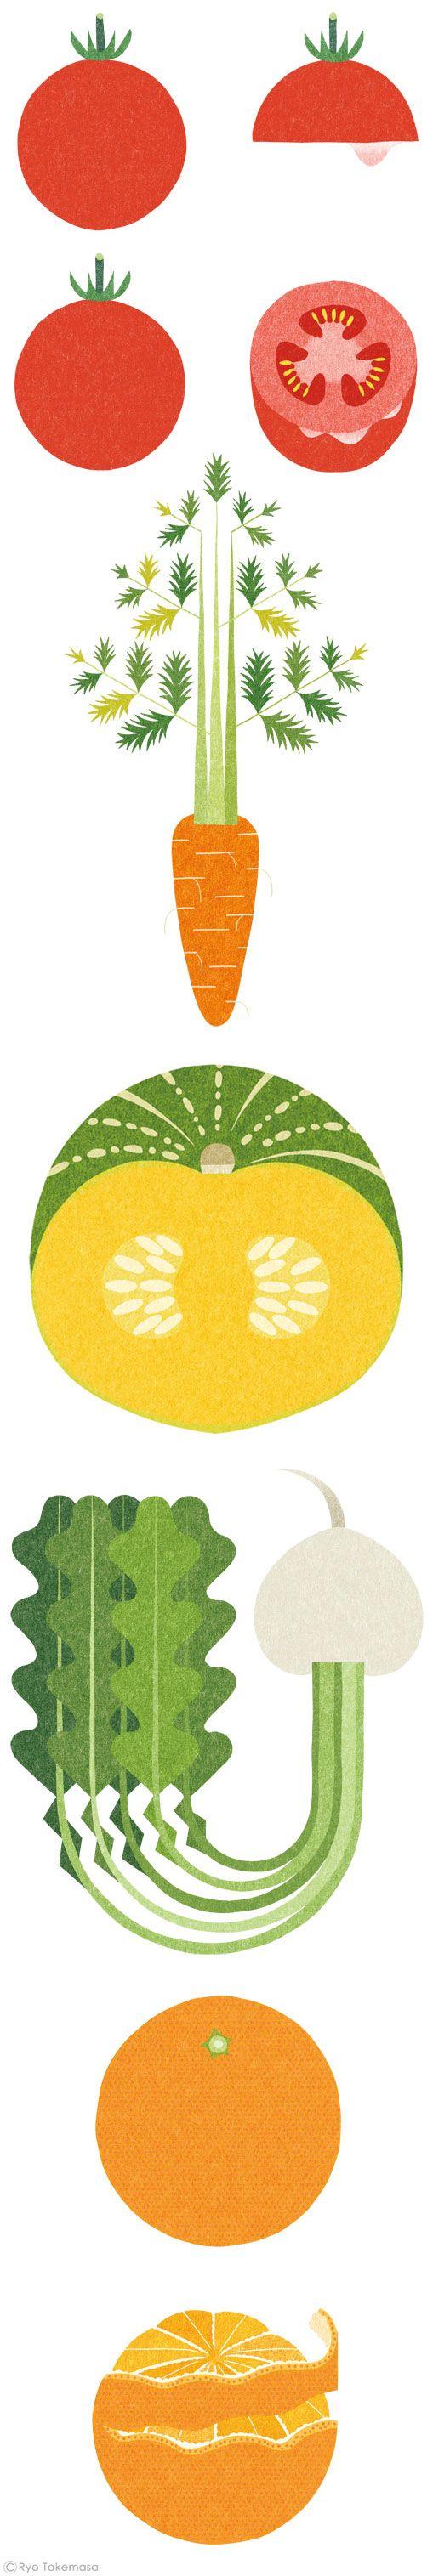 Ryo Takemasa fruit & vegetable illustration